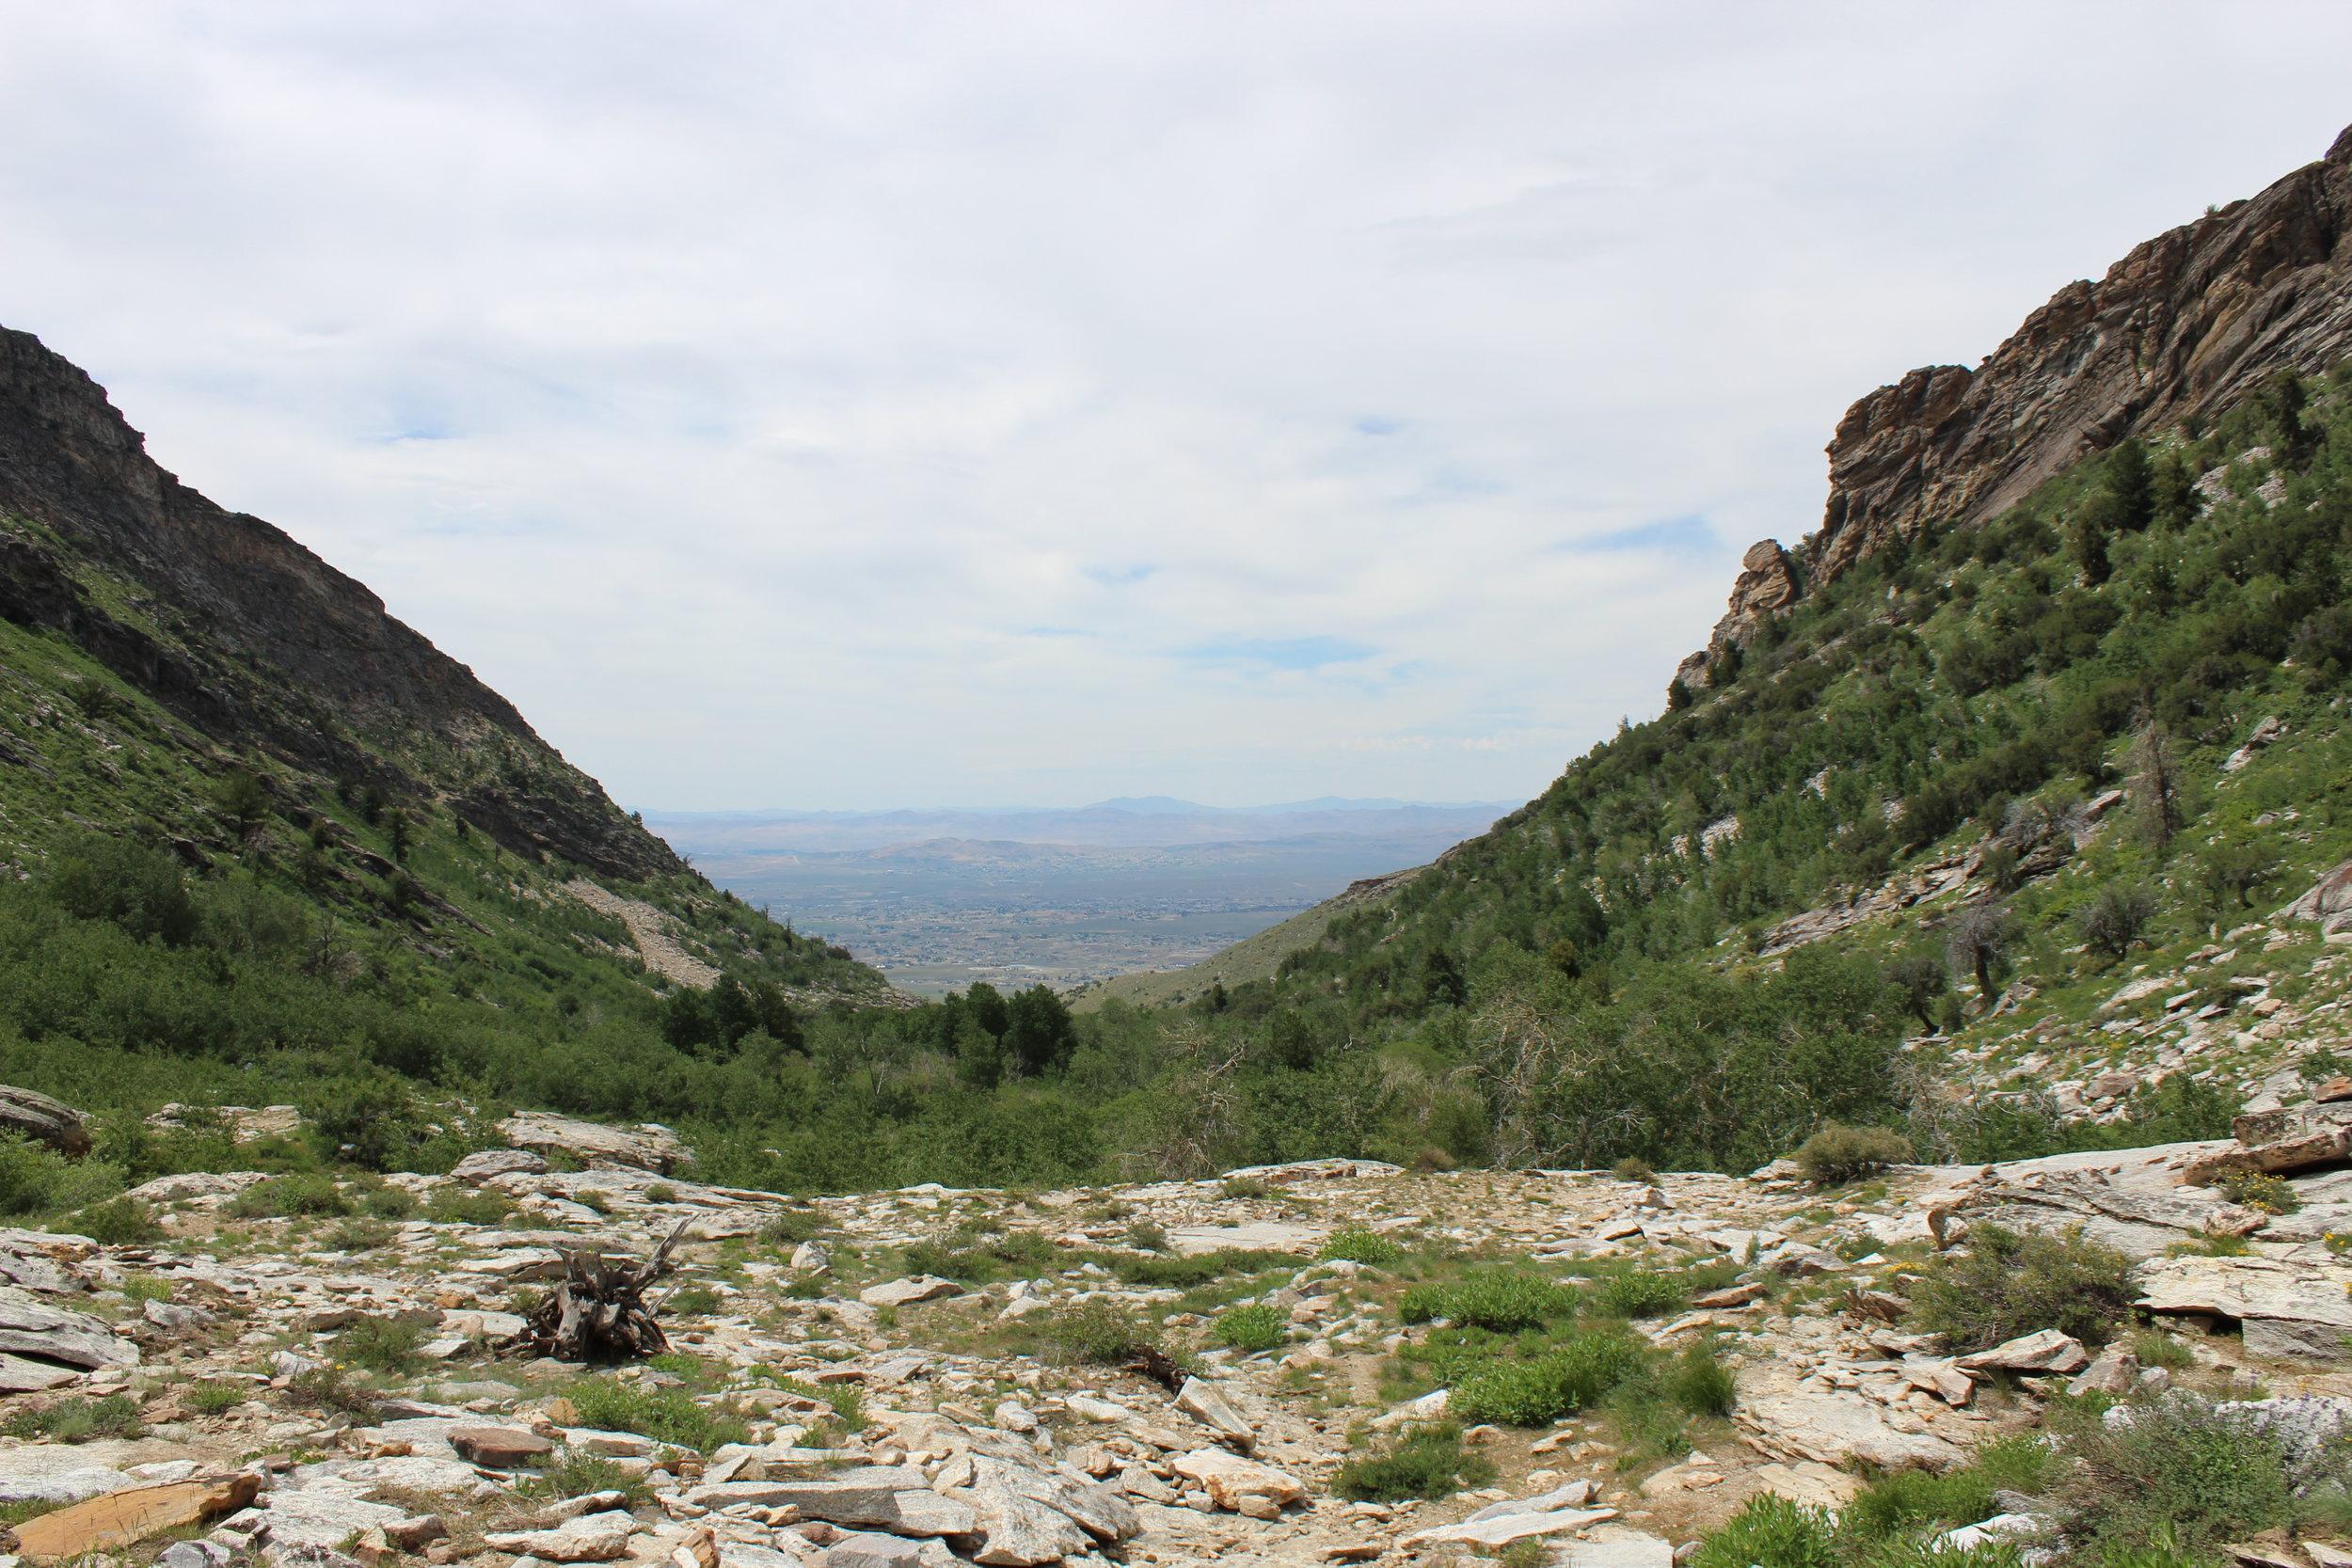 Looking down Hennen Canyon toward Elko.